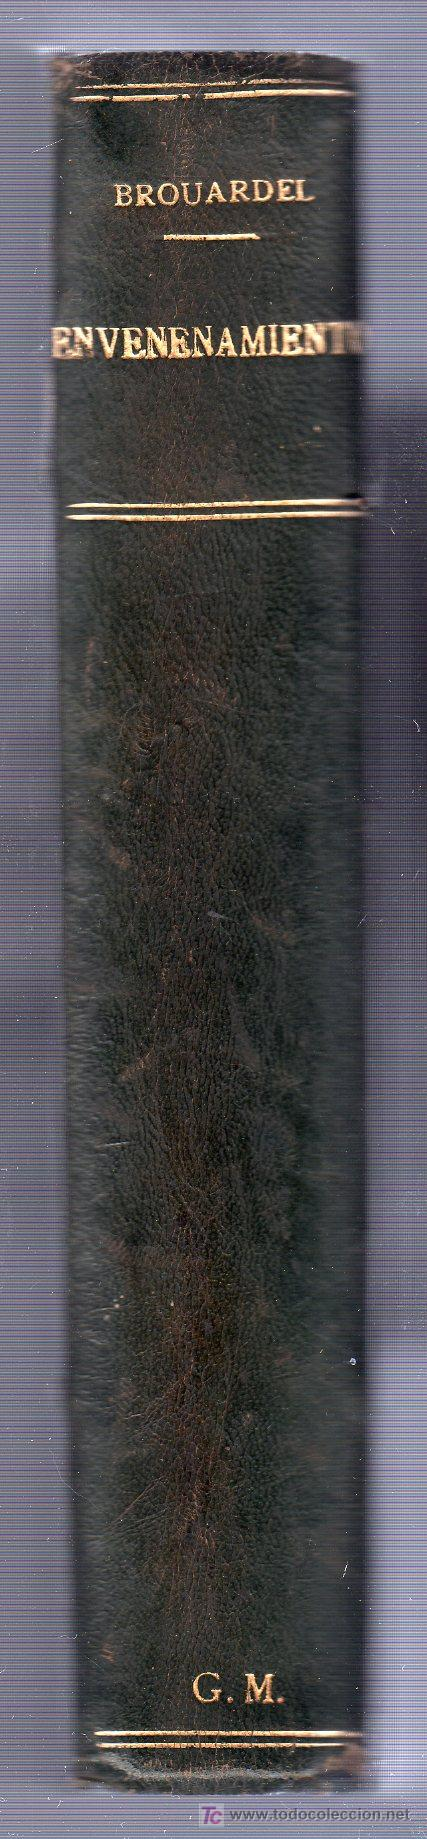 Libros antiguos: ENVENENAMIENTO POR P. BROUARDEL. LIBRAIRIE J.B. BAILLIERE ET FILS. PARIS 1902 - Foto 2 - 26851181